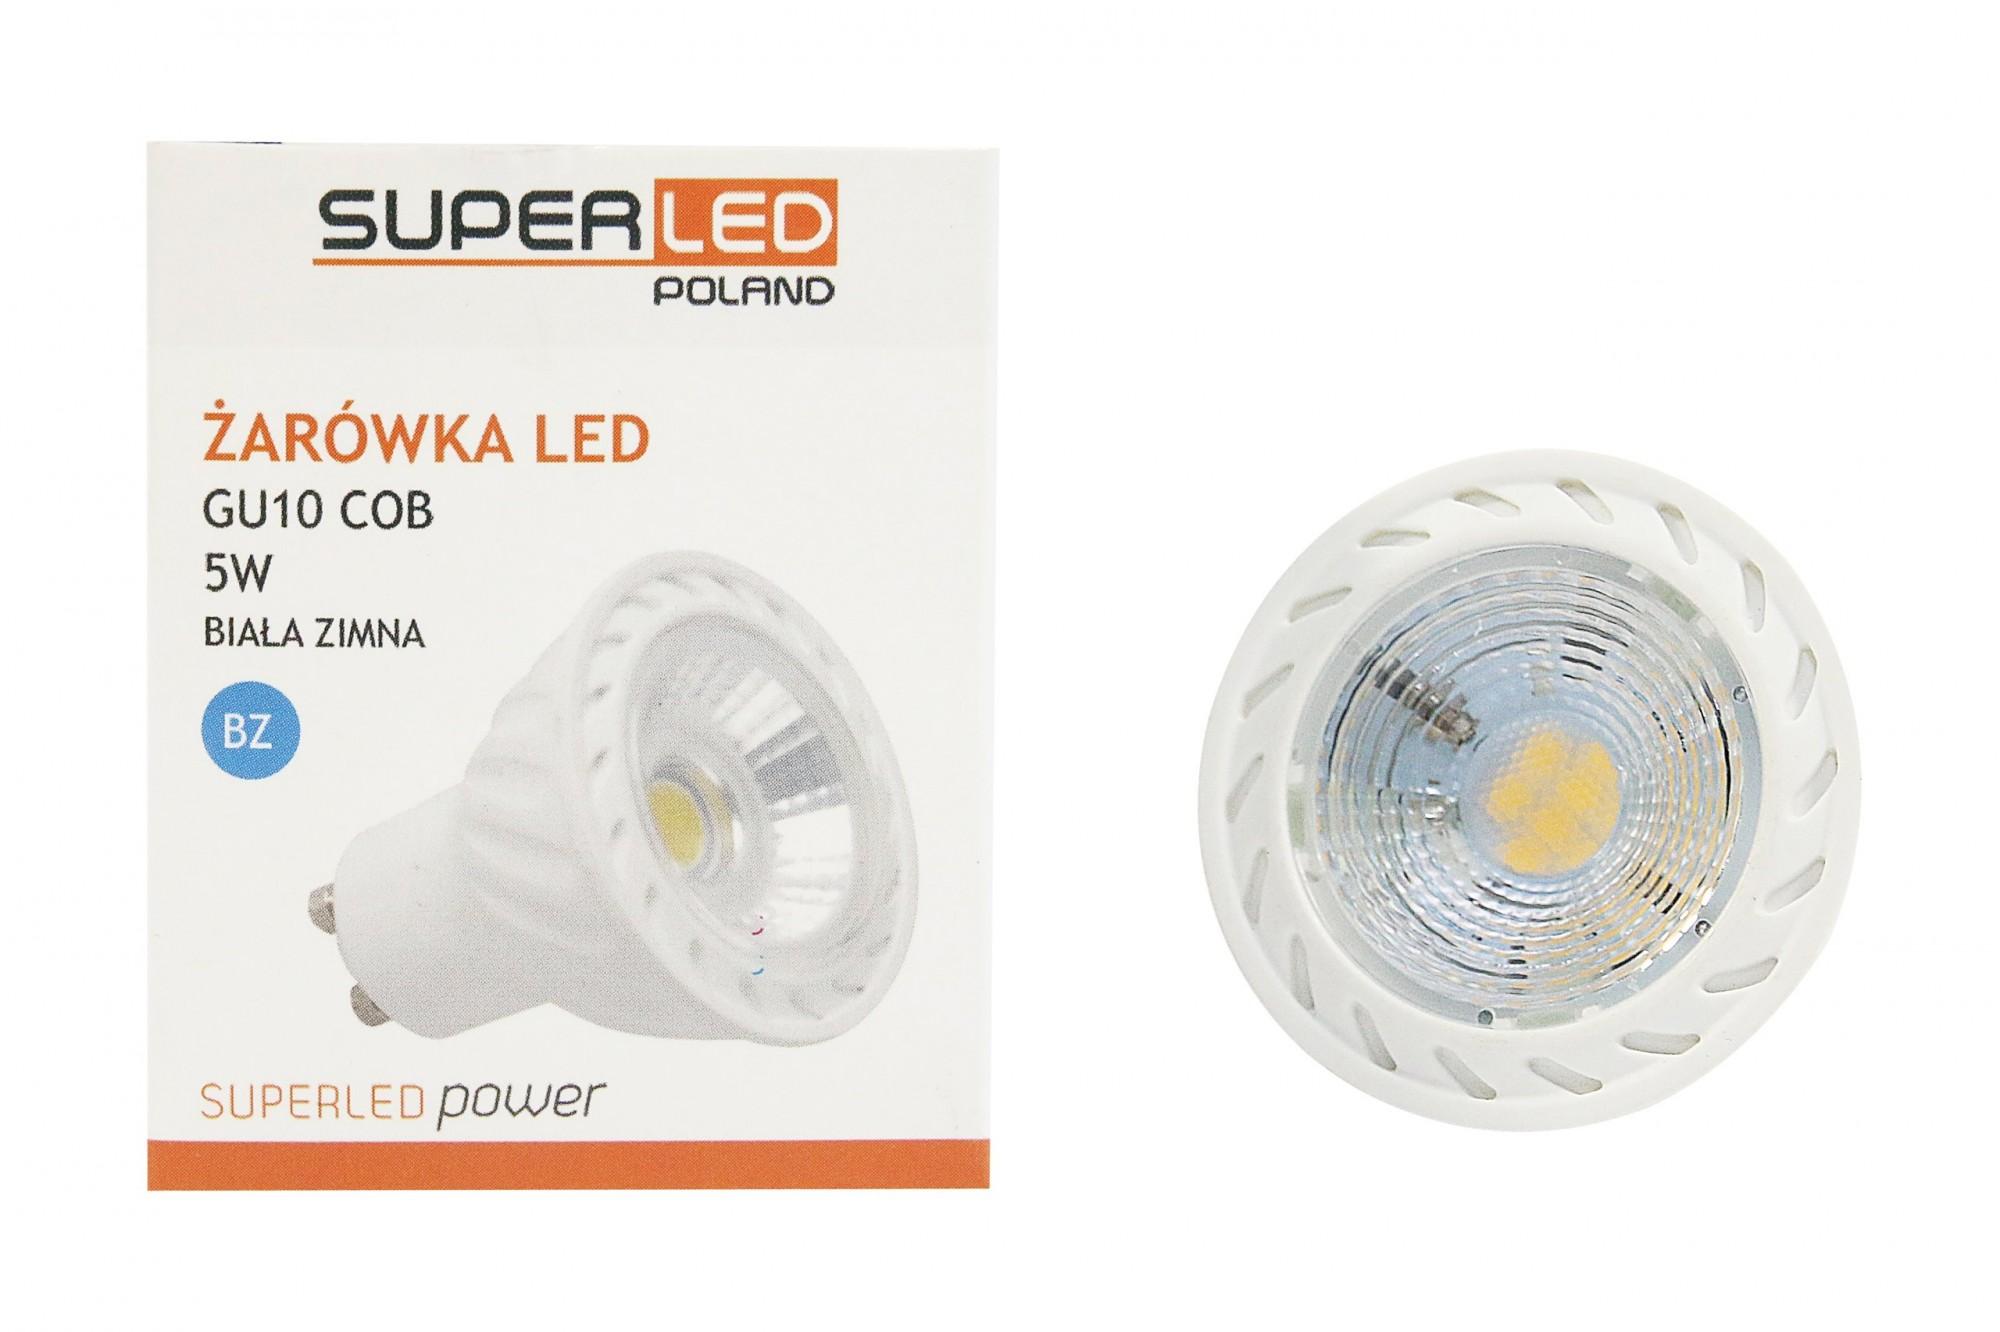 Žárovka LED GU10 COBEN SMD 450lm 5w = 50w Ra80 60° NESMYSL